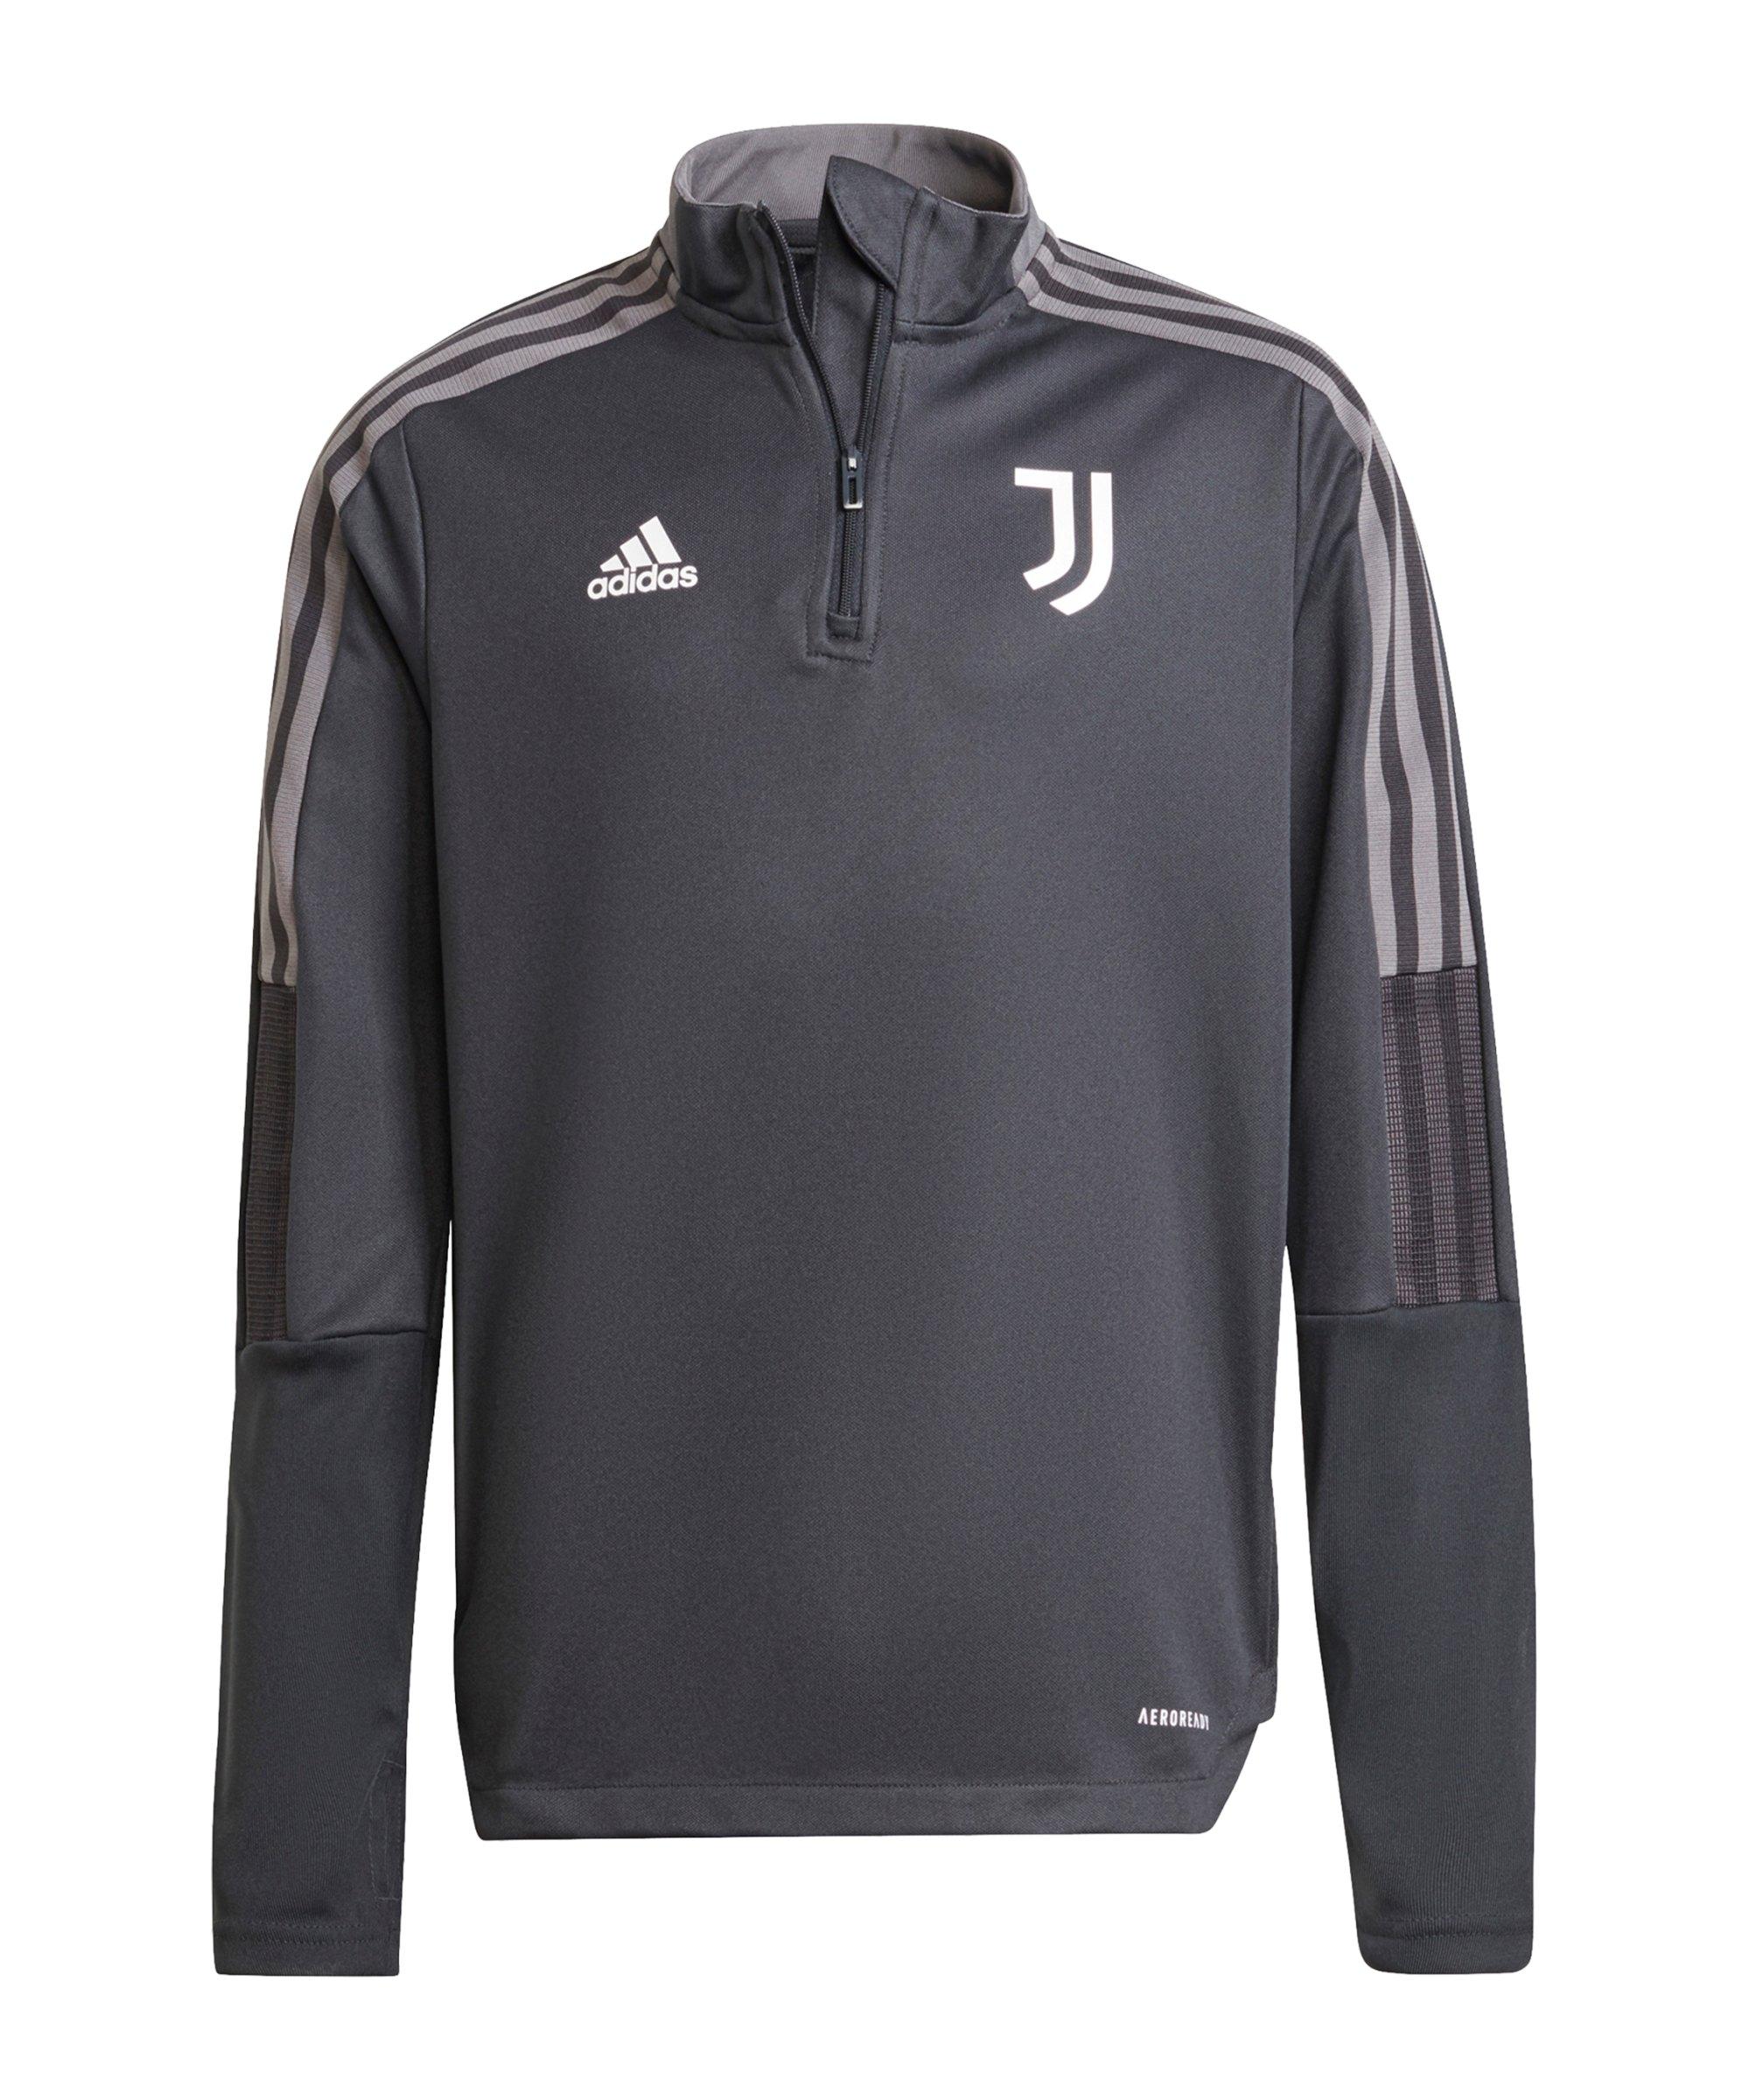 adidas Juventus Turin HalfZip Sweatshirt Kids Grau - grau